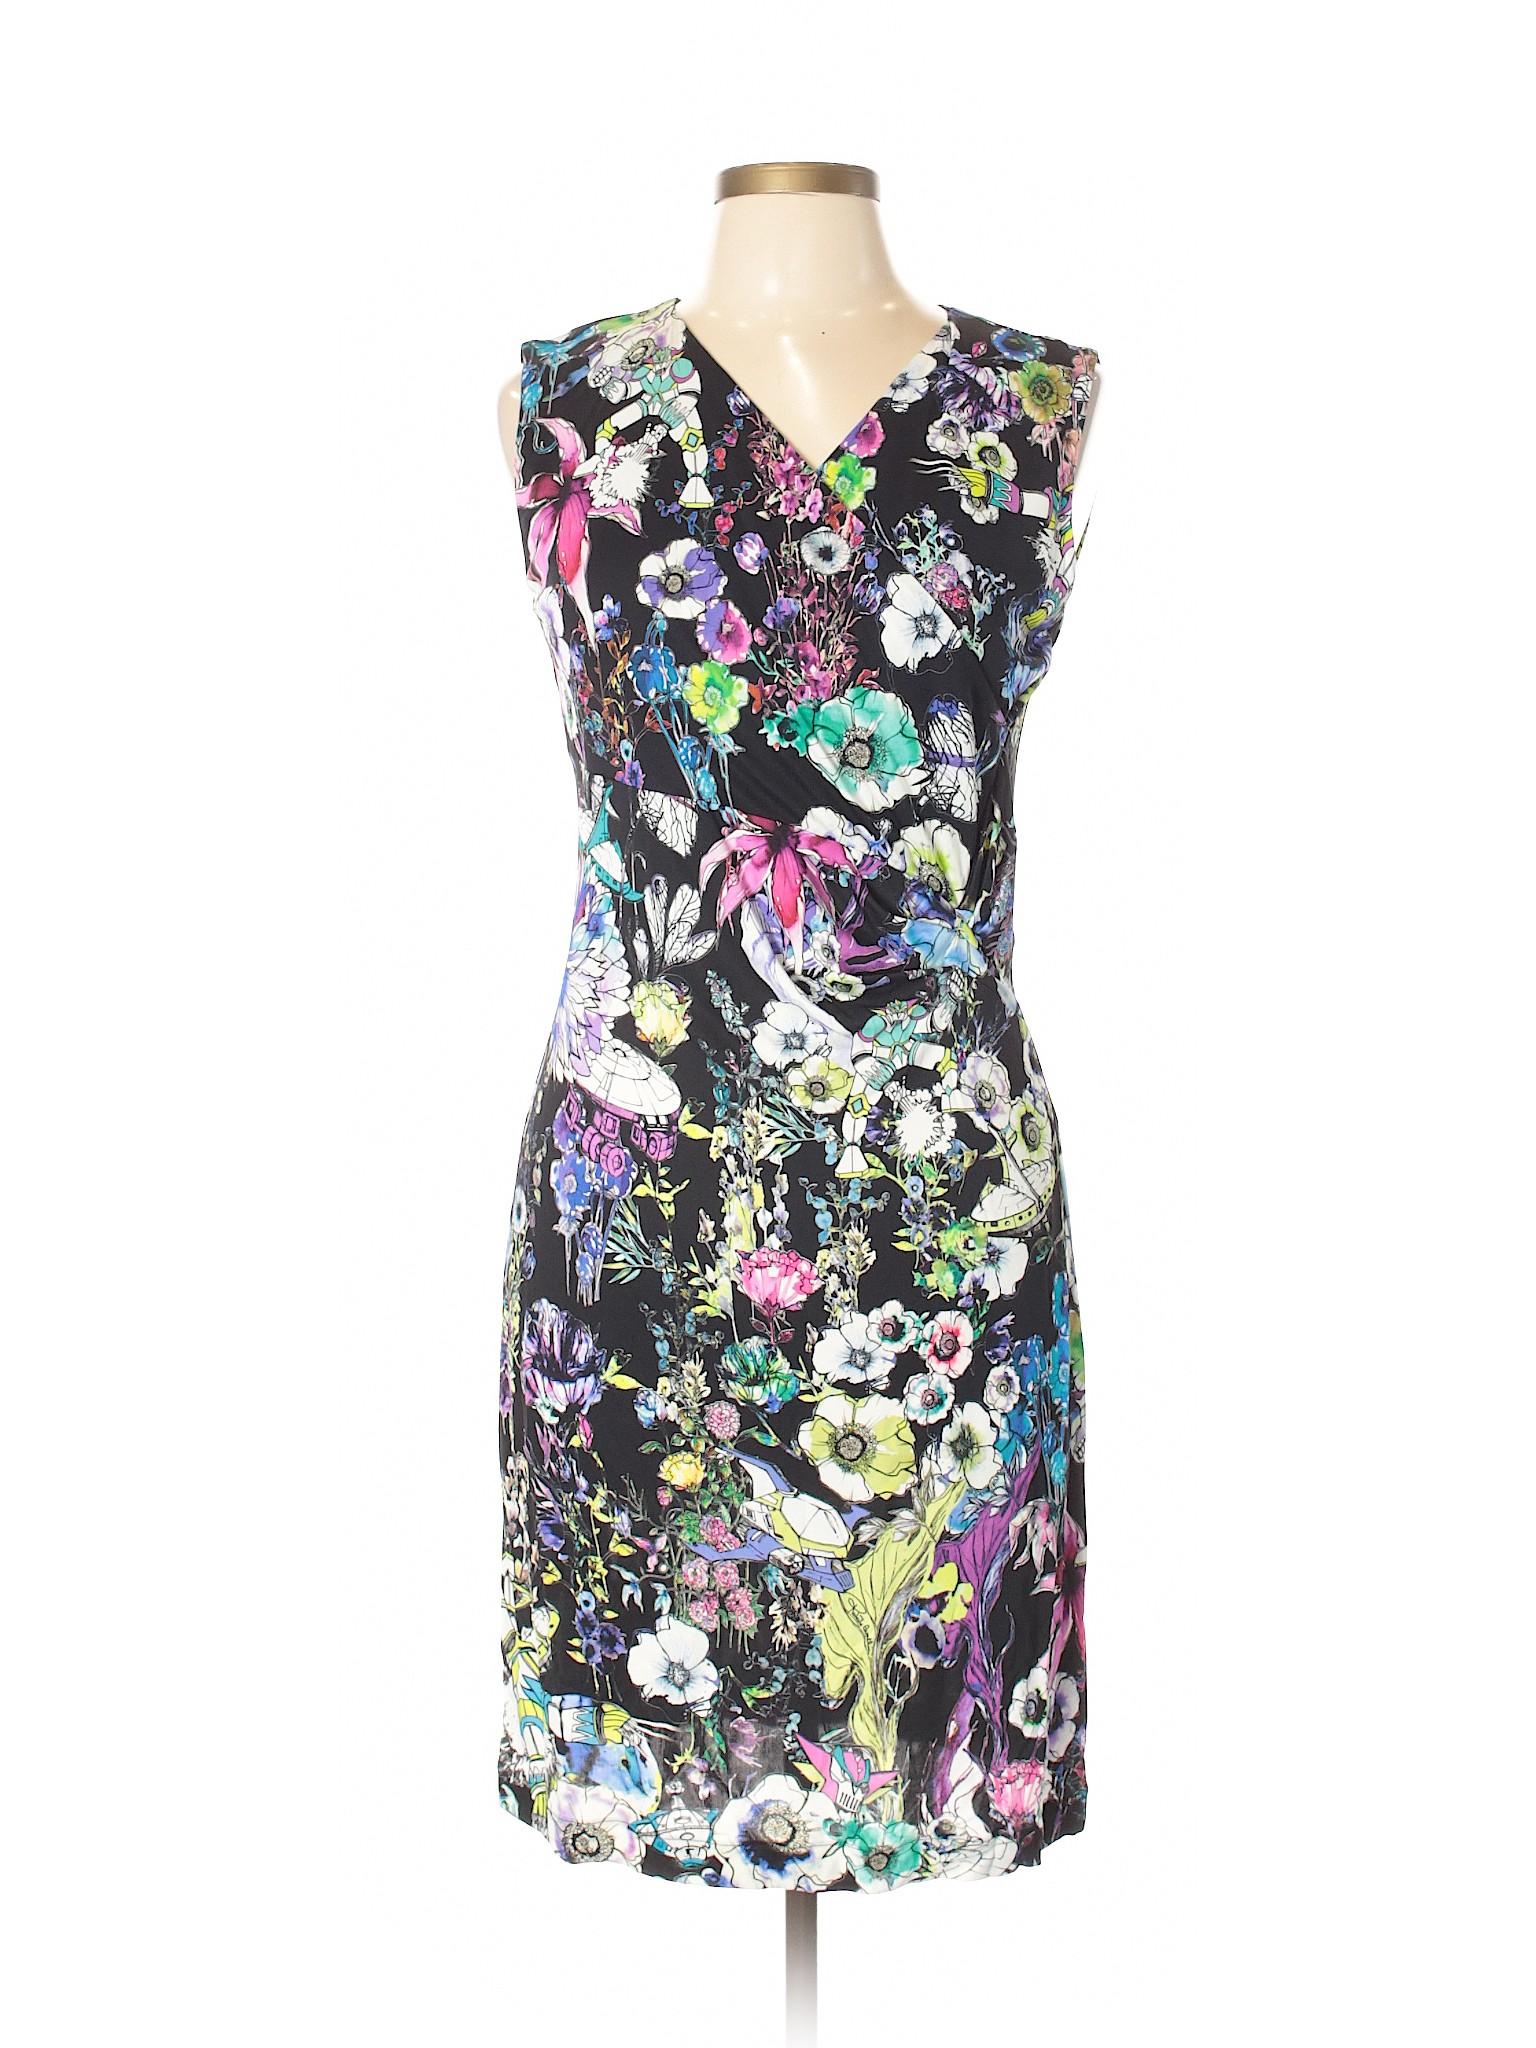 Dress Selling Casual Astro Garden Roberto Cavalli qwzXgC